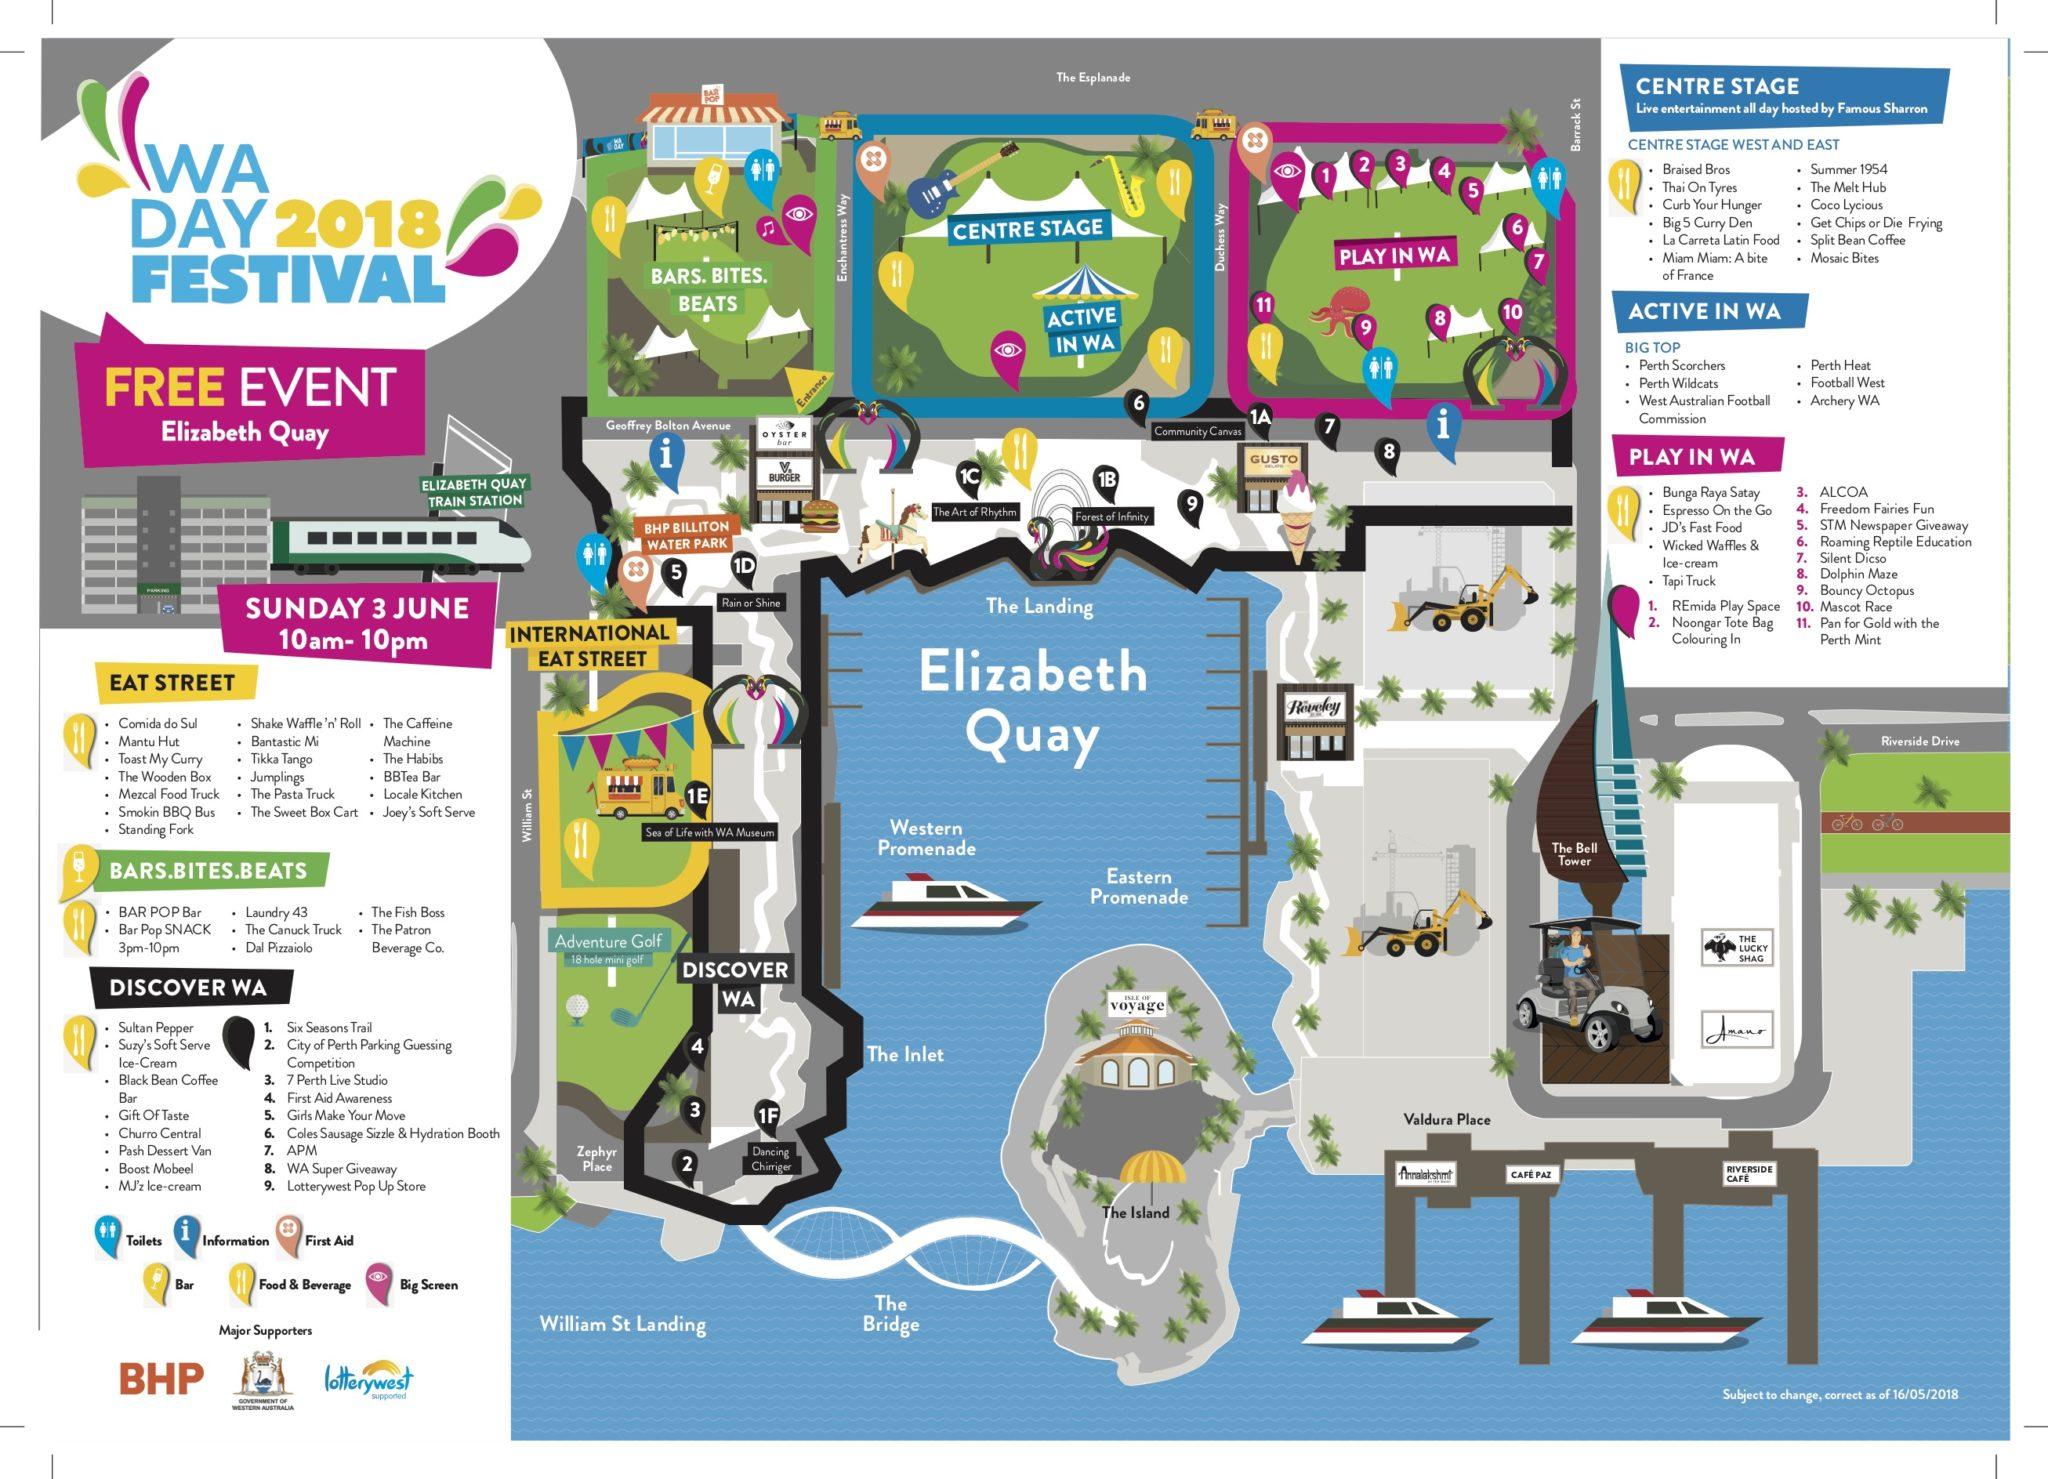 2018-WA-Day-Festival-Map-Elizabeth-Quay-FINAL-APPROVED